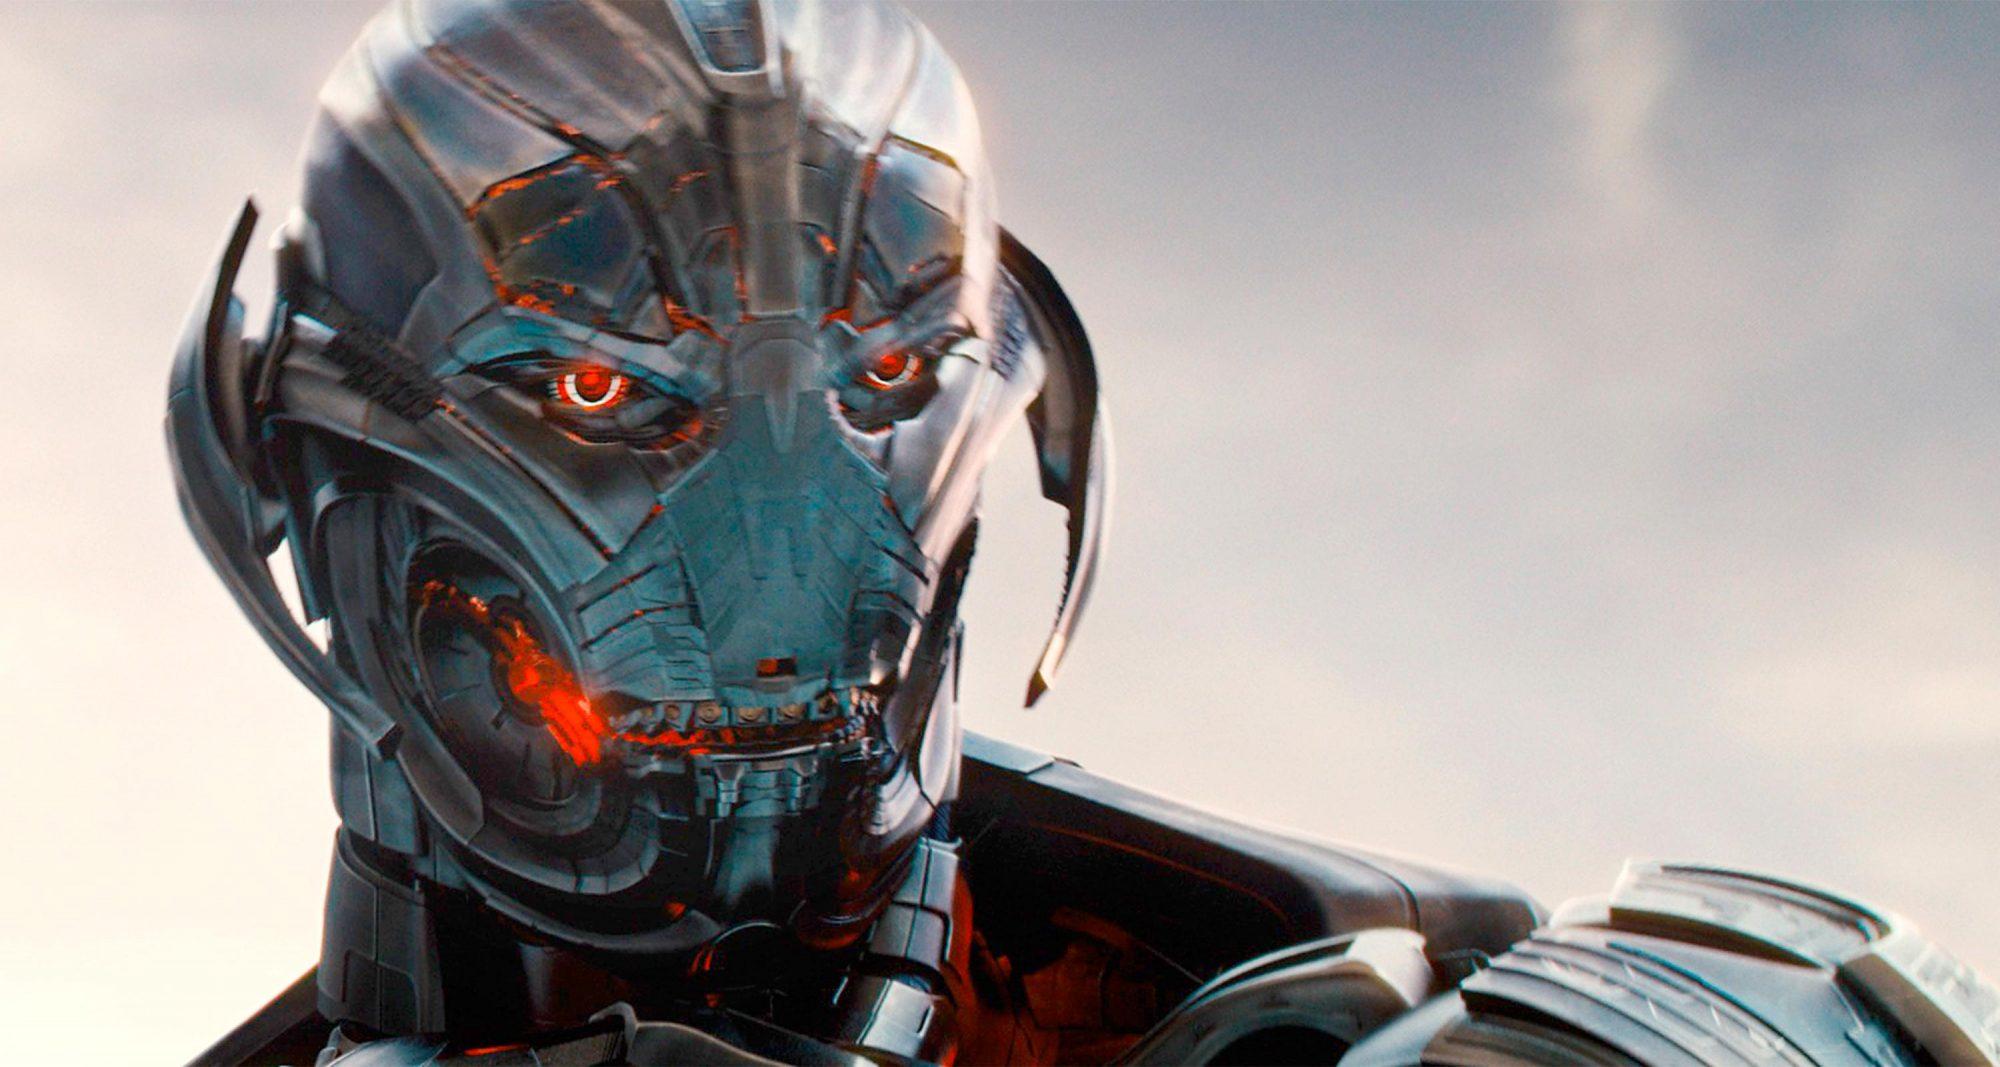 Avengers: Age of Ultron (2015) Ultron